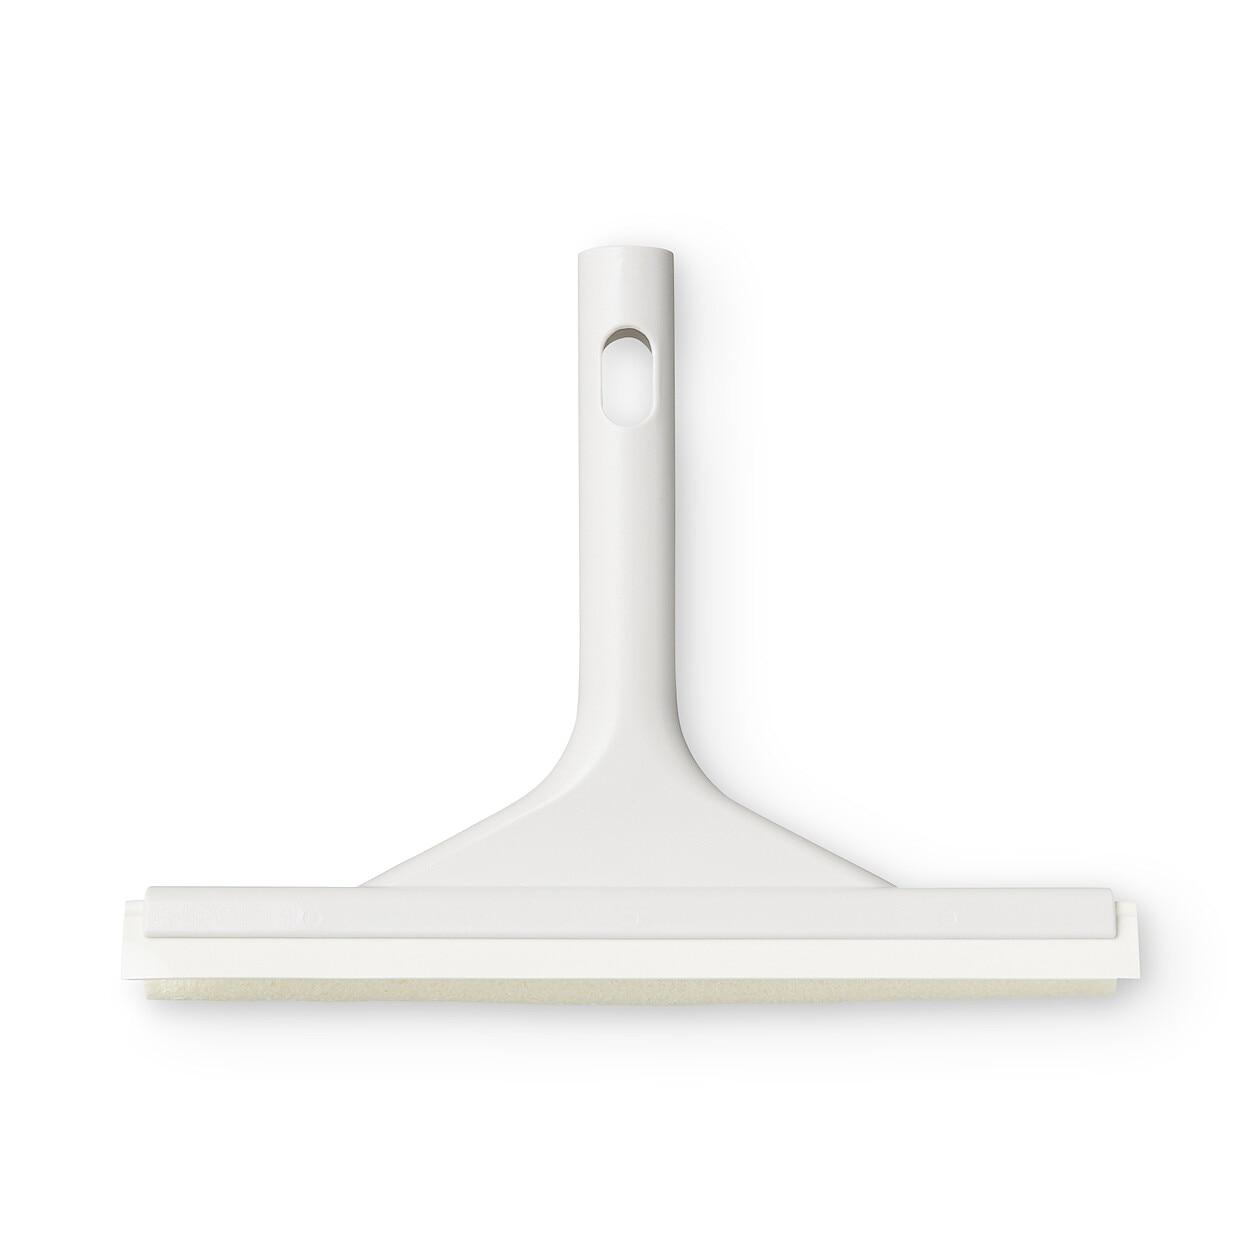 RoomClip商品情報 - 掃除用品システム・スキージー